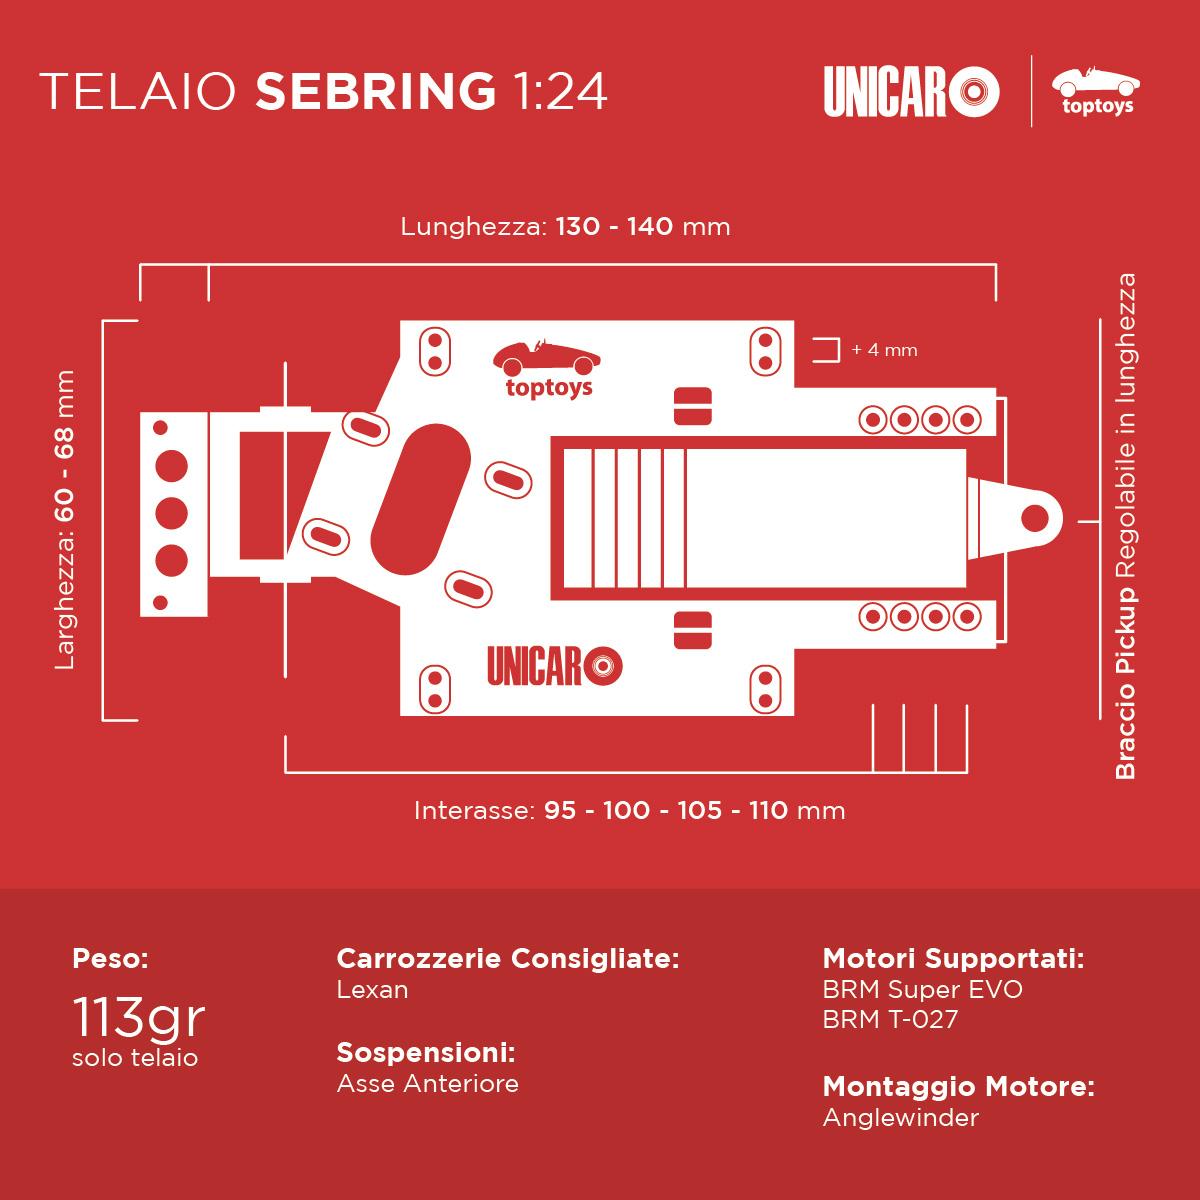 https://www.orlandinifrancesco.com/wp/wp-content/uploads/2019/06/Scheda-Tecnica-Telaio-Sebring.jpg